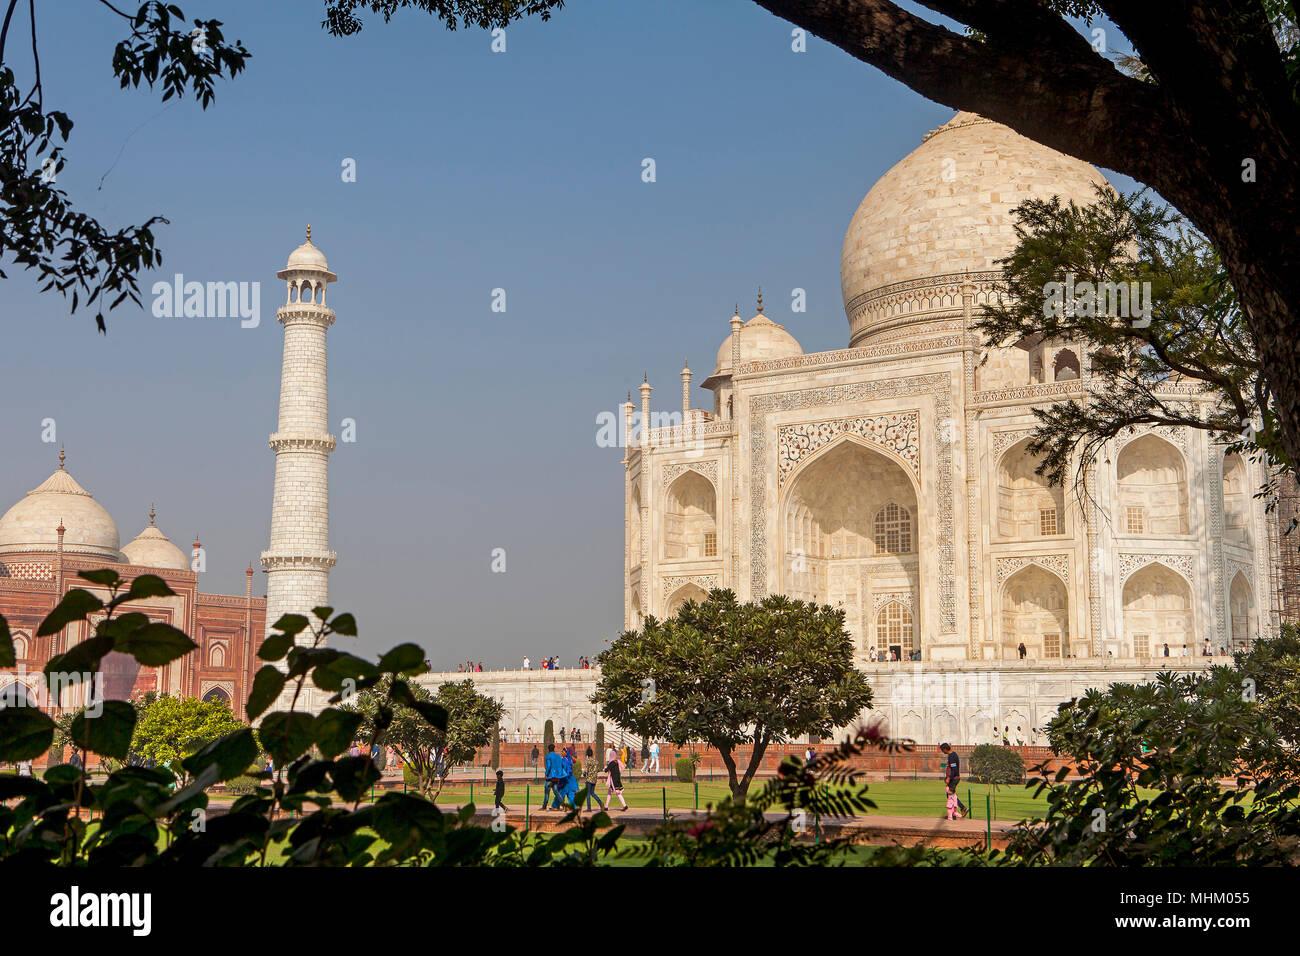 Taj Mahal, UNESCO World Heritage Site, Agra, Uttar Pradesh, India - Stock Image